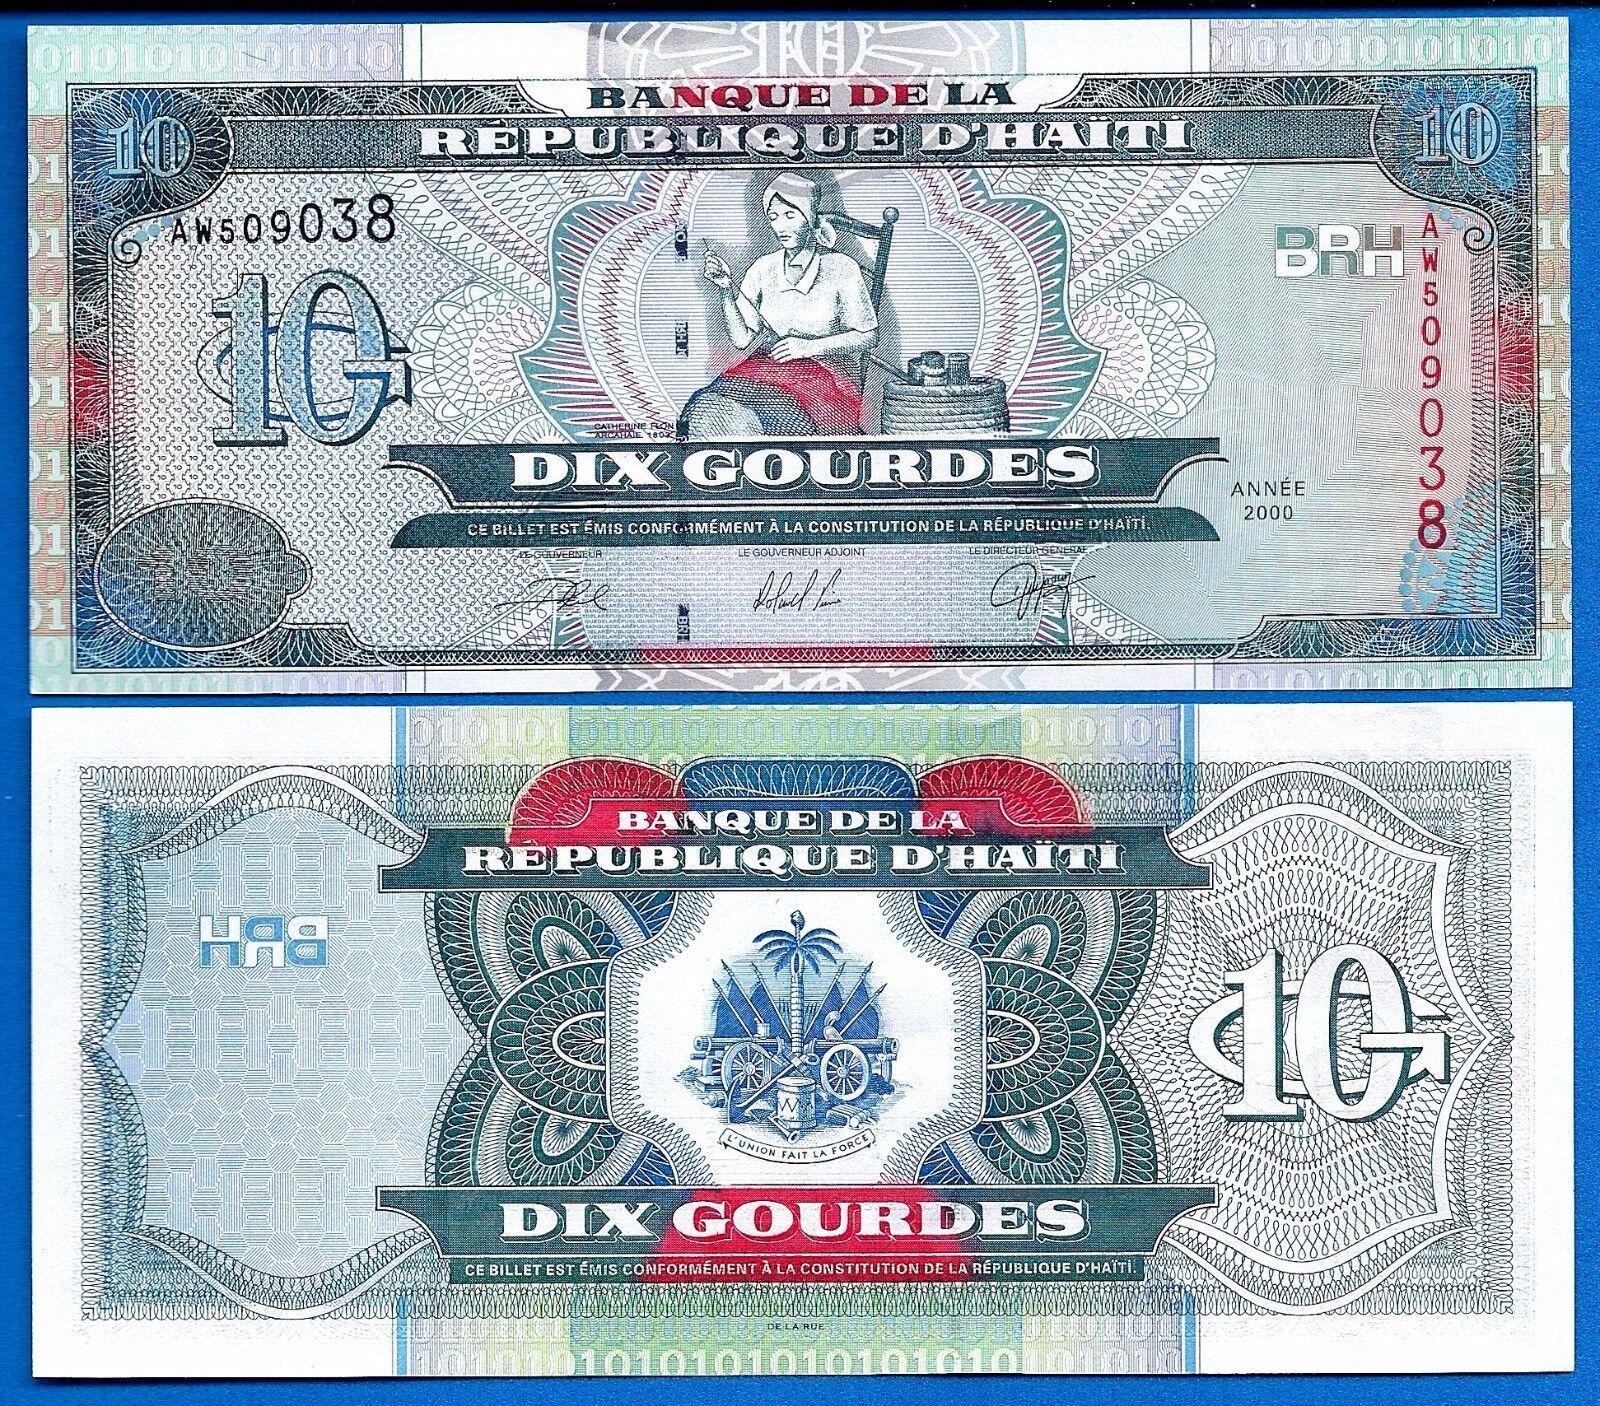 Haiti P-265 10 Gourdes Year 2000 Uncirculated Banknote South America